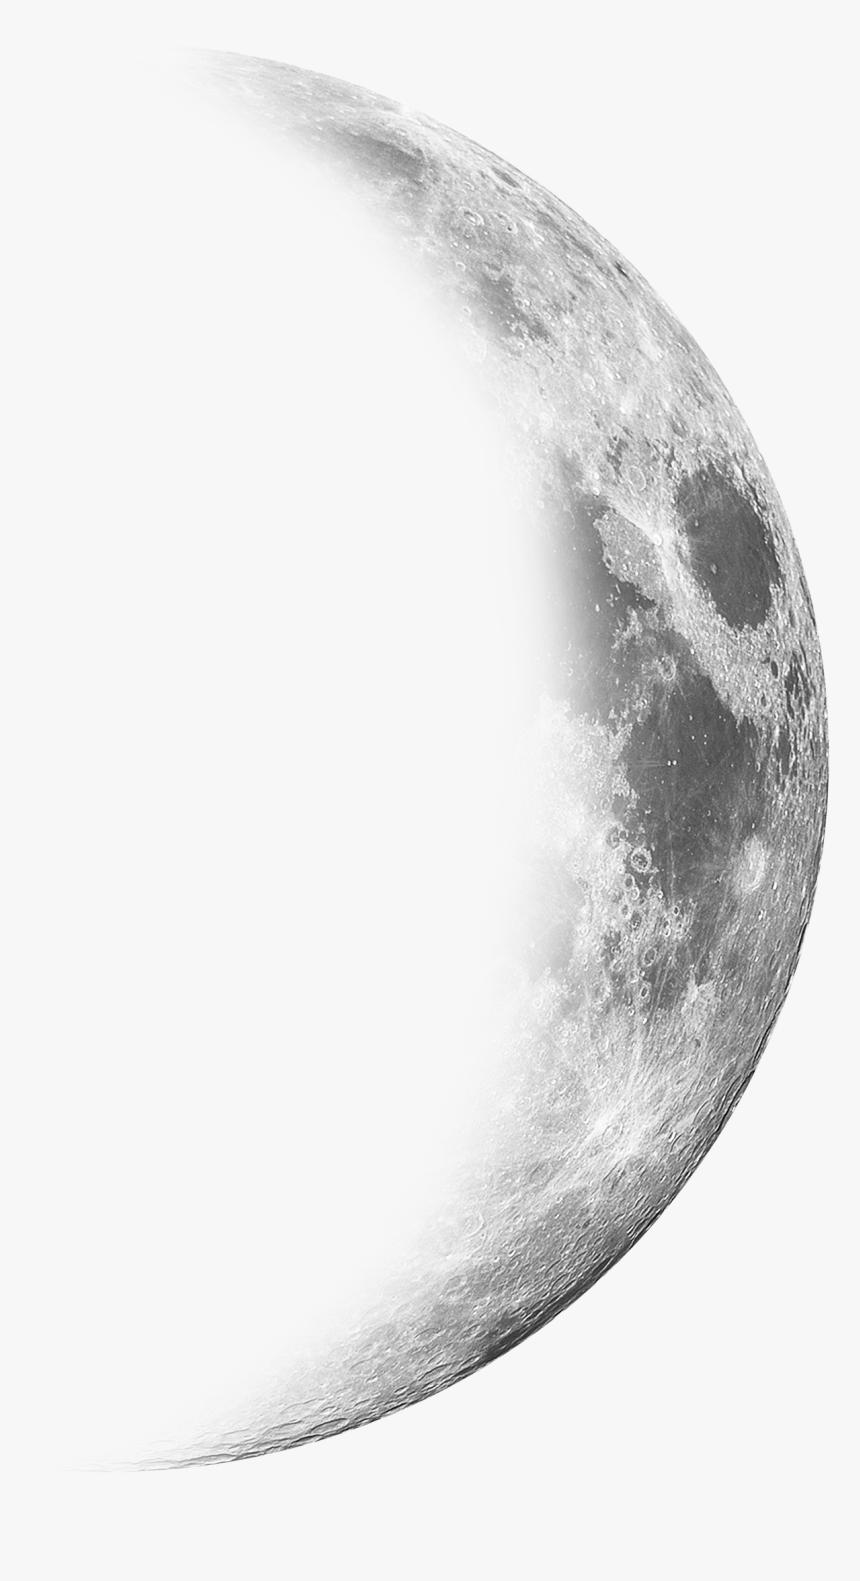 Transparent Crescent Moon Crescent Moon Transparent Background Hd Png Download Kindpng